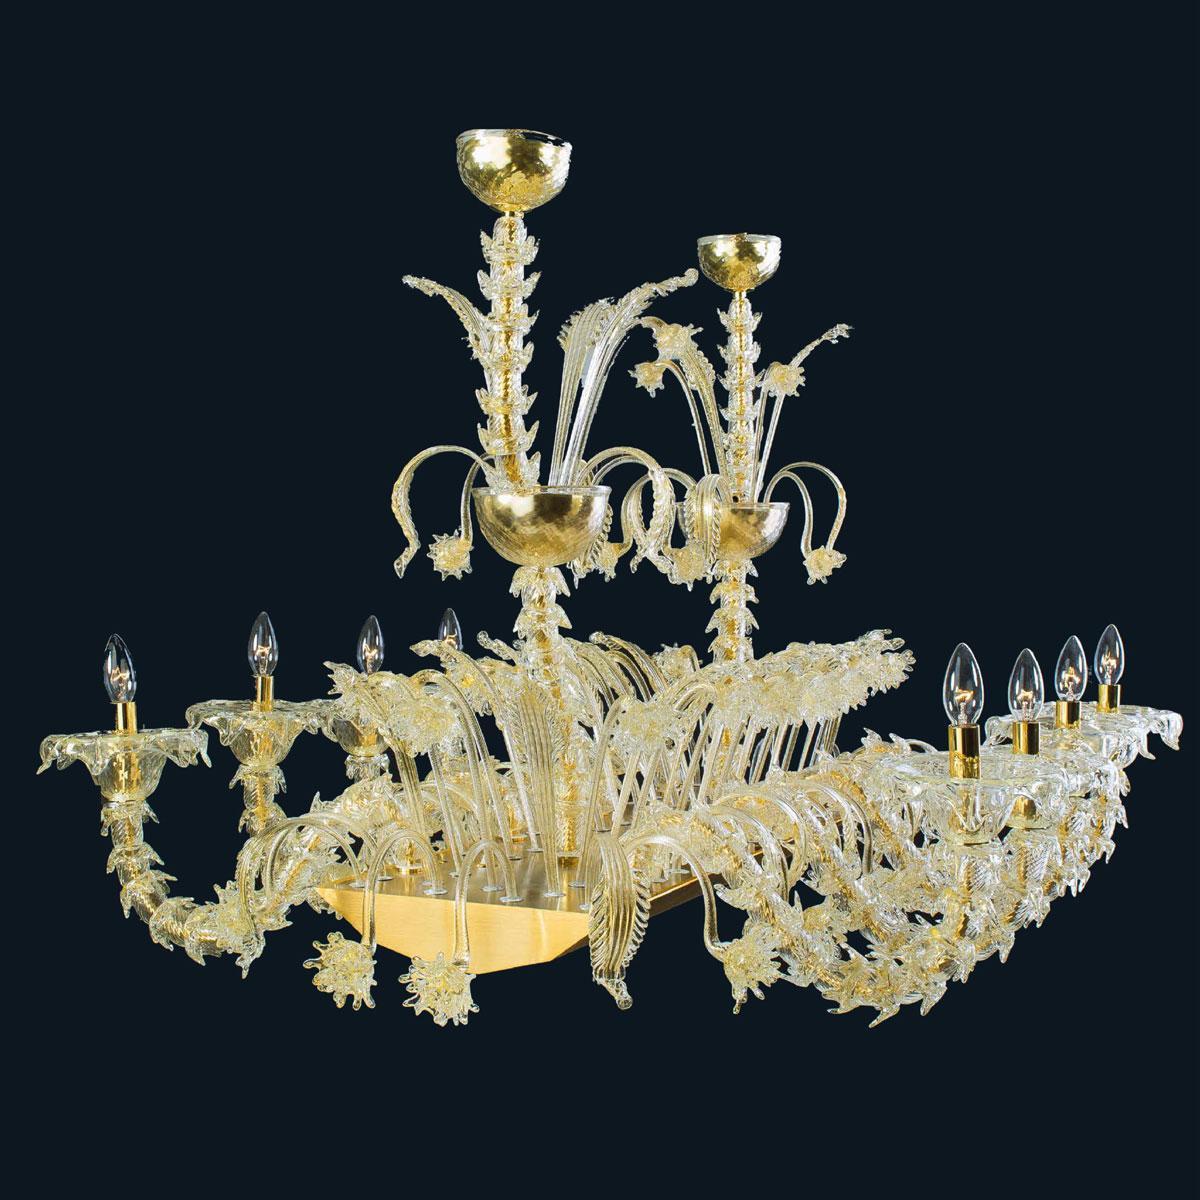 """Alvin"" Murano glas Kronleuchter - 8 flammig - gold"